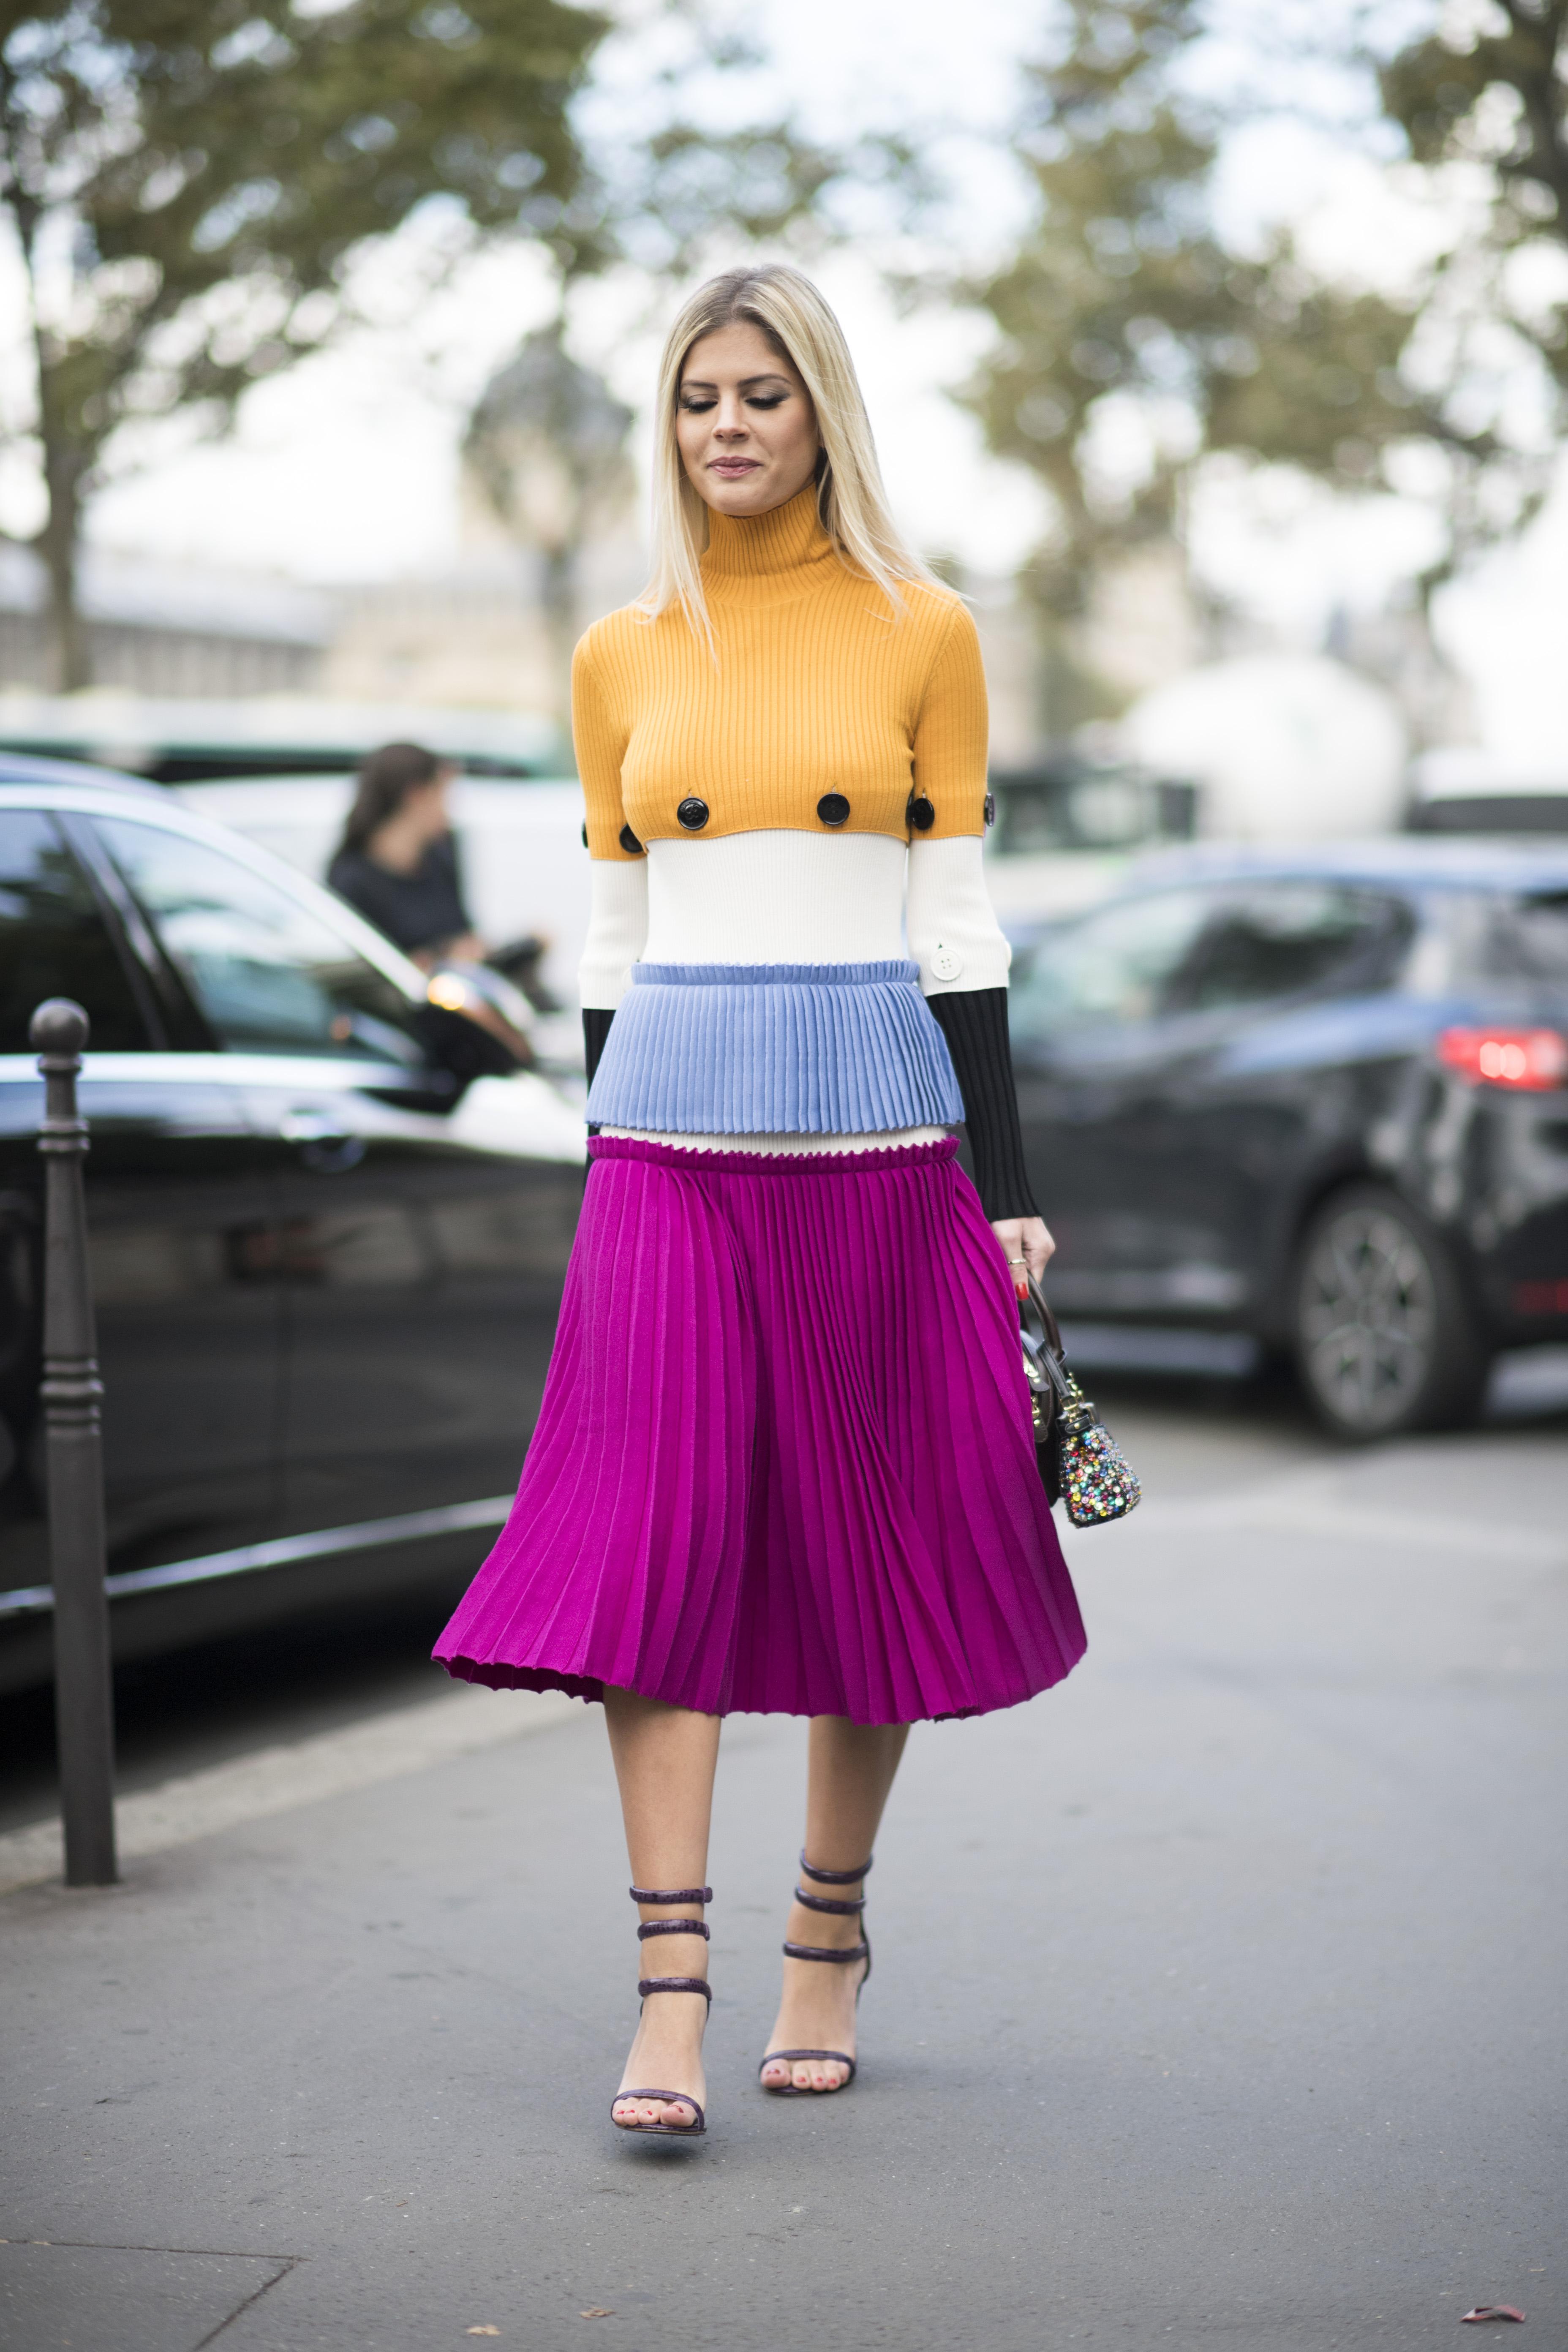 Parisian Summer Street Fashion Images